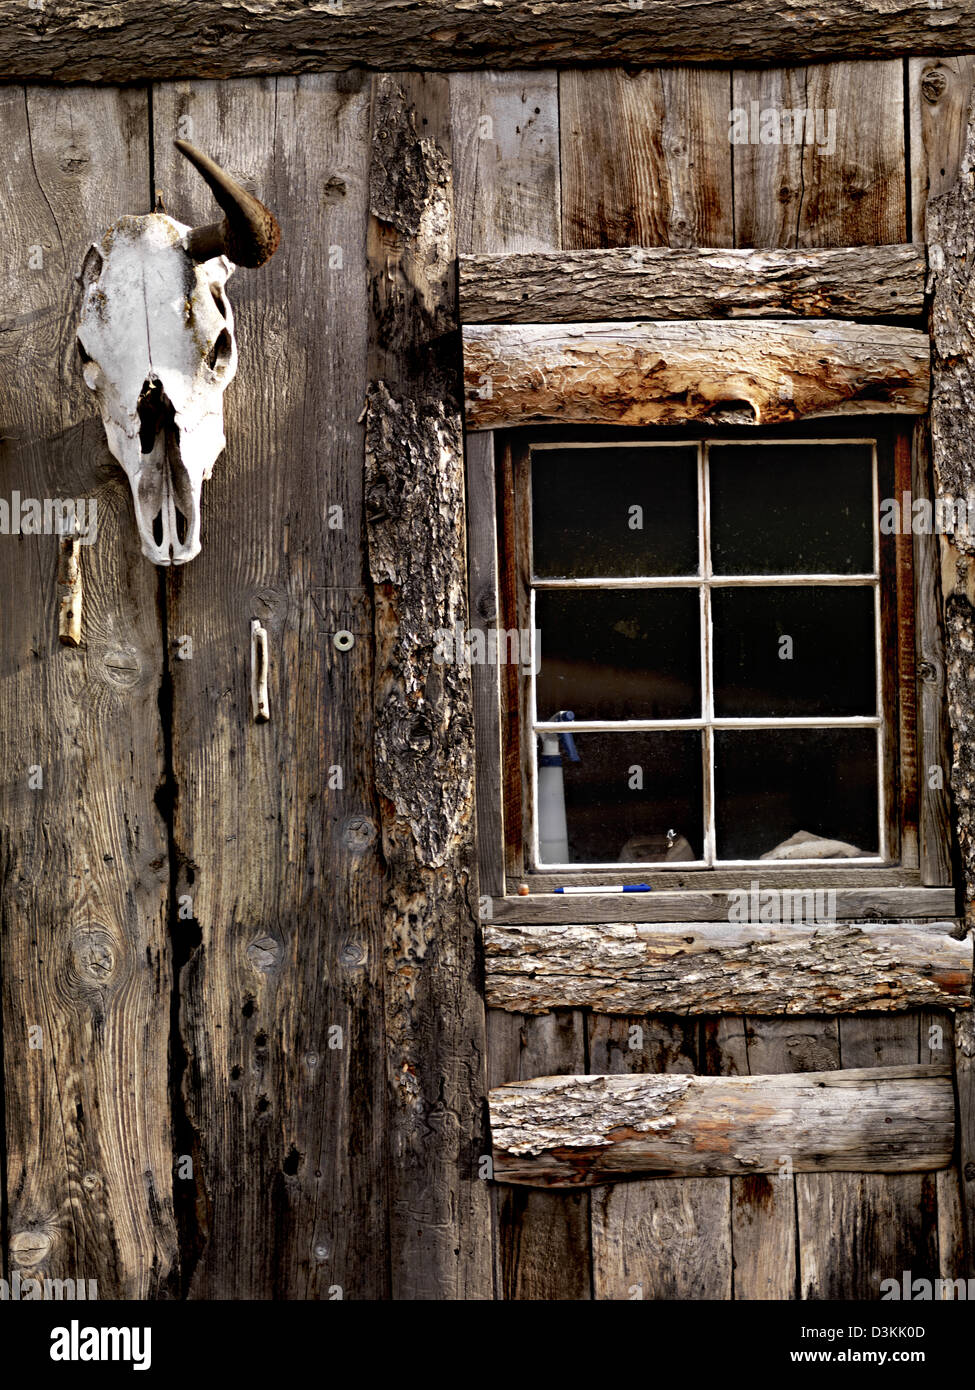 Window with school, log cabin, Montana, USA Stock Photo